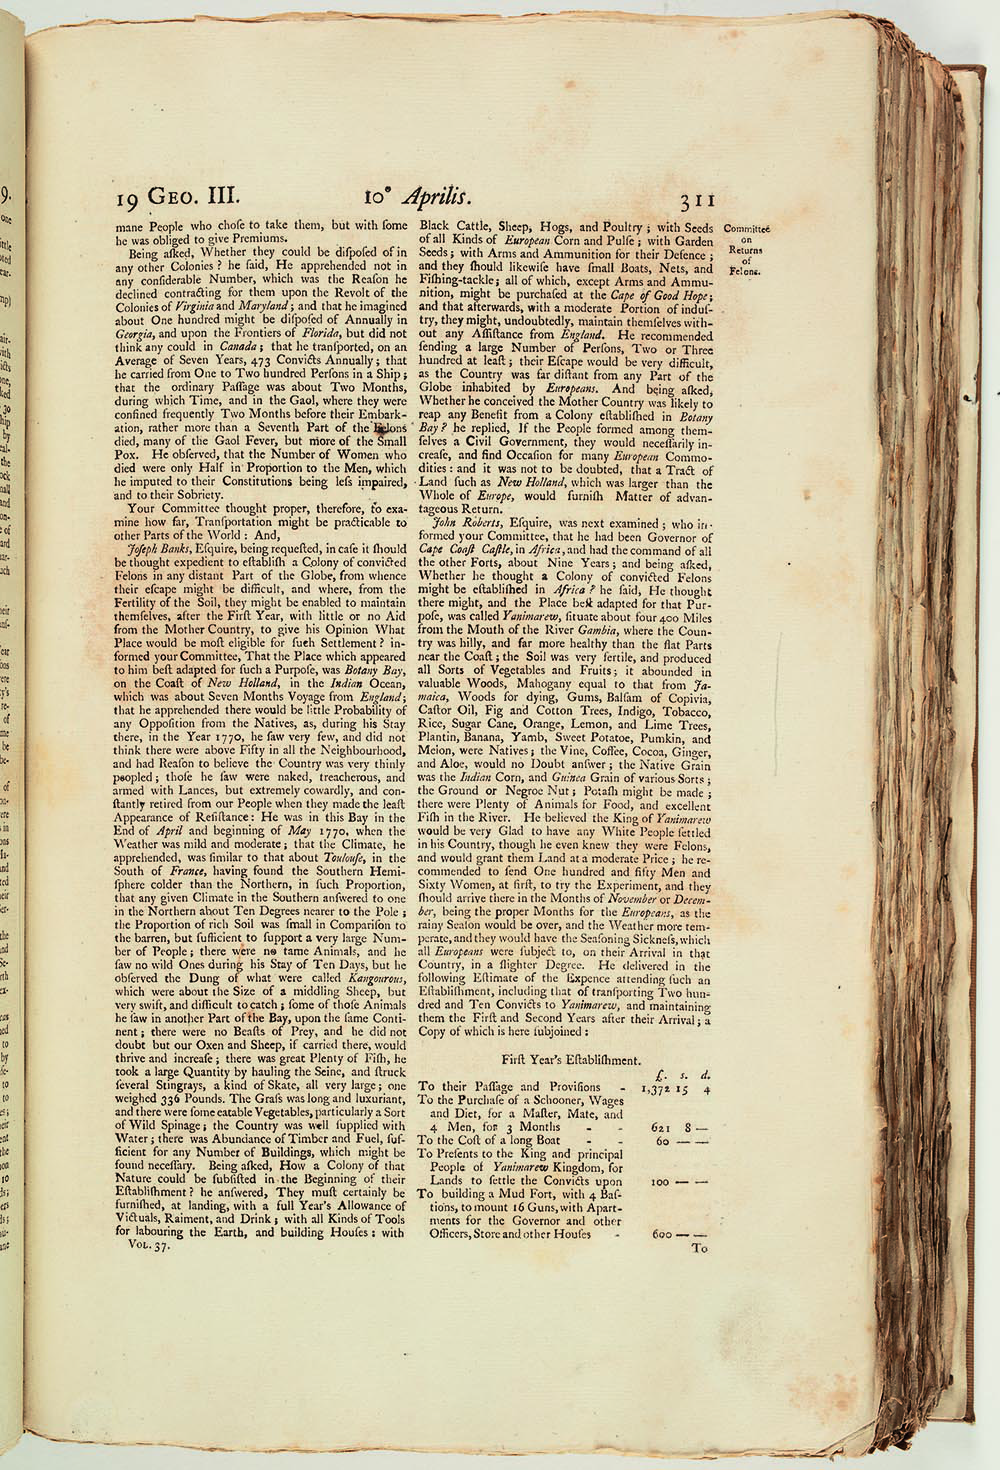 Testimony from Bunbury Parliamentary Committee, 1779